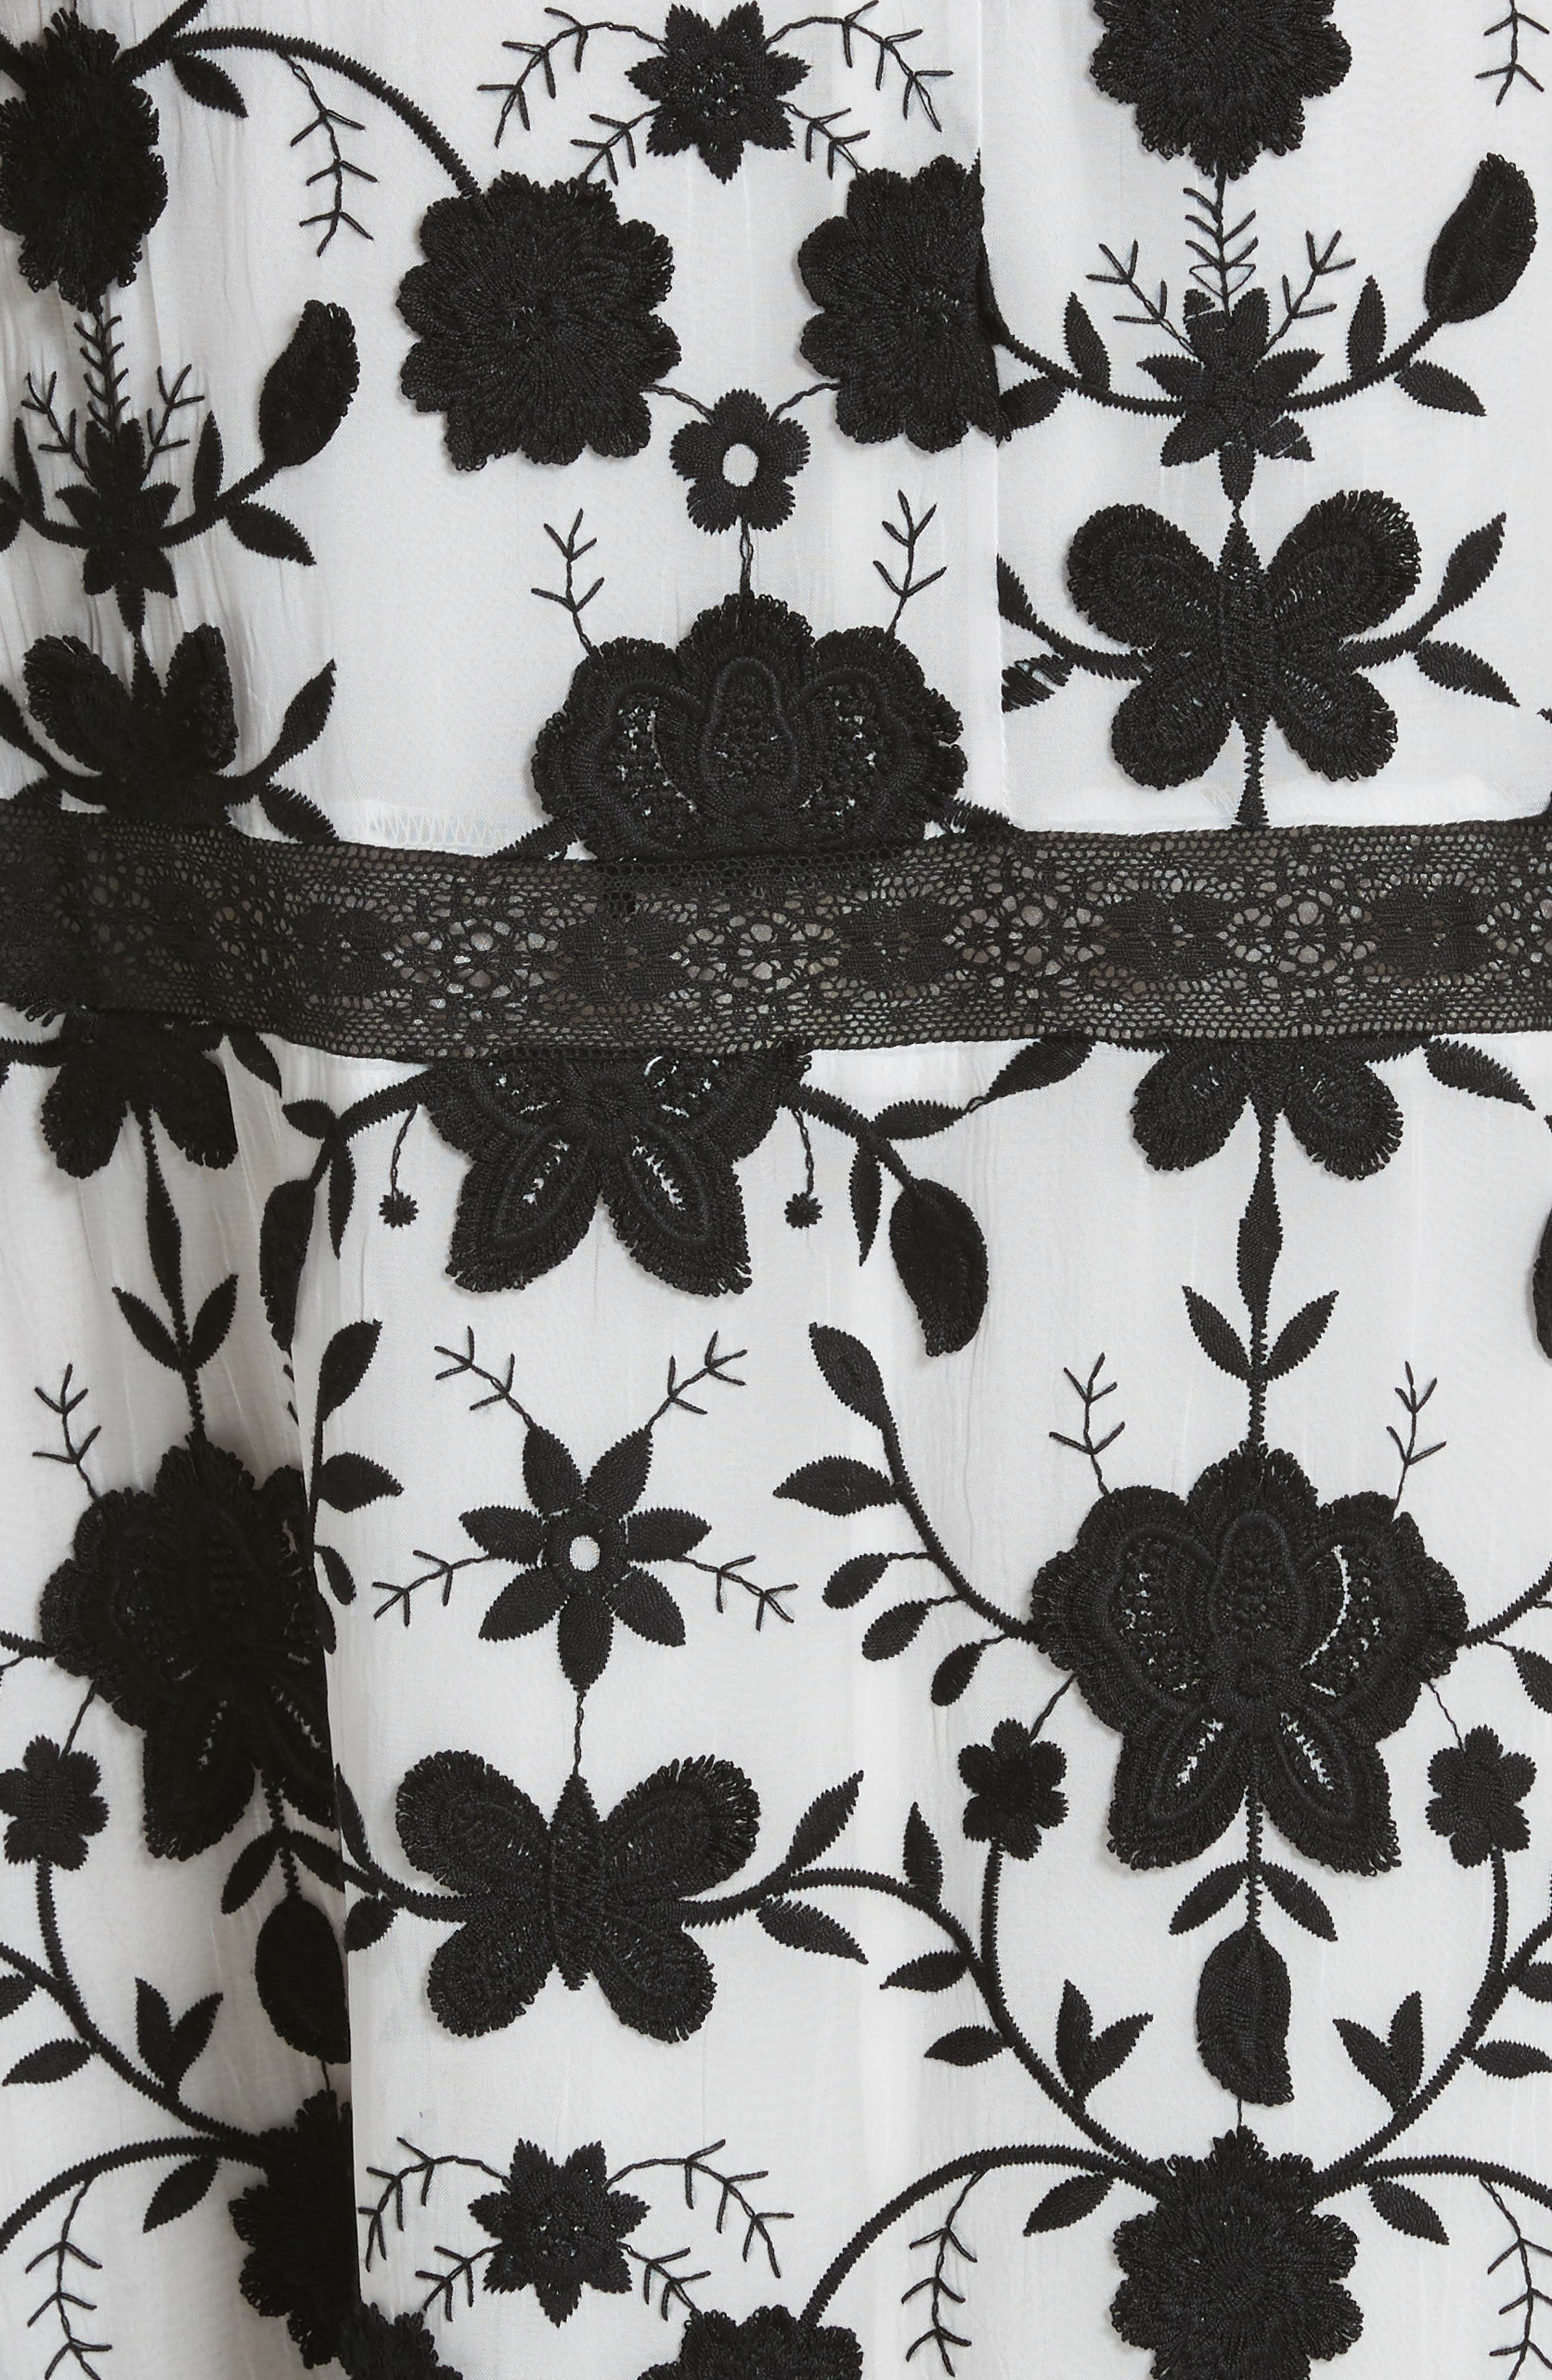 Fusca Floral Print Maxi Dress,                             Alternate thumbnail 5, color,                             018